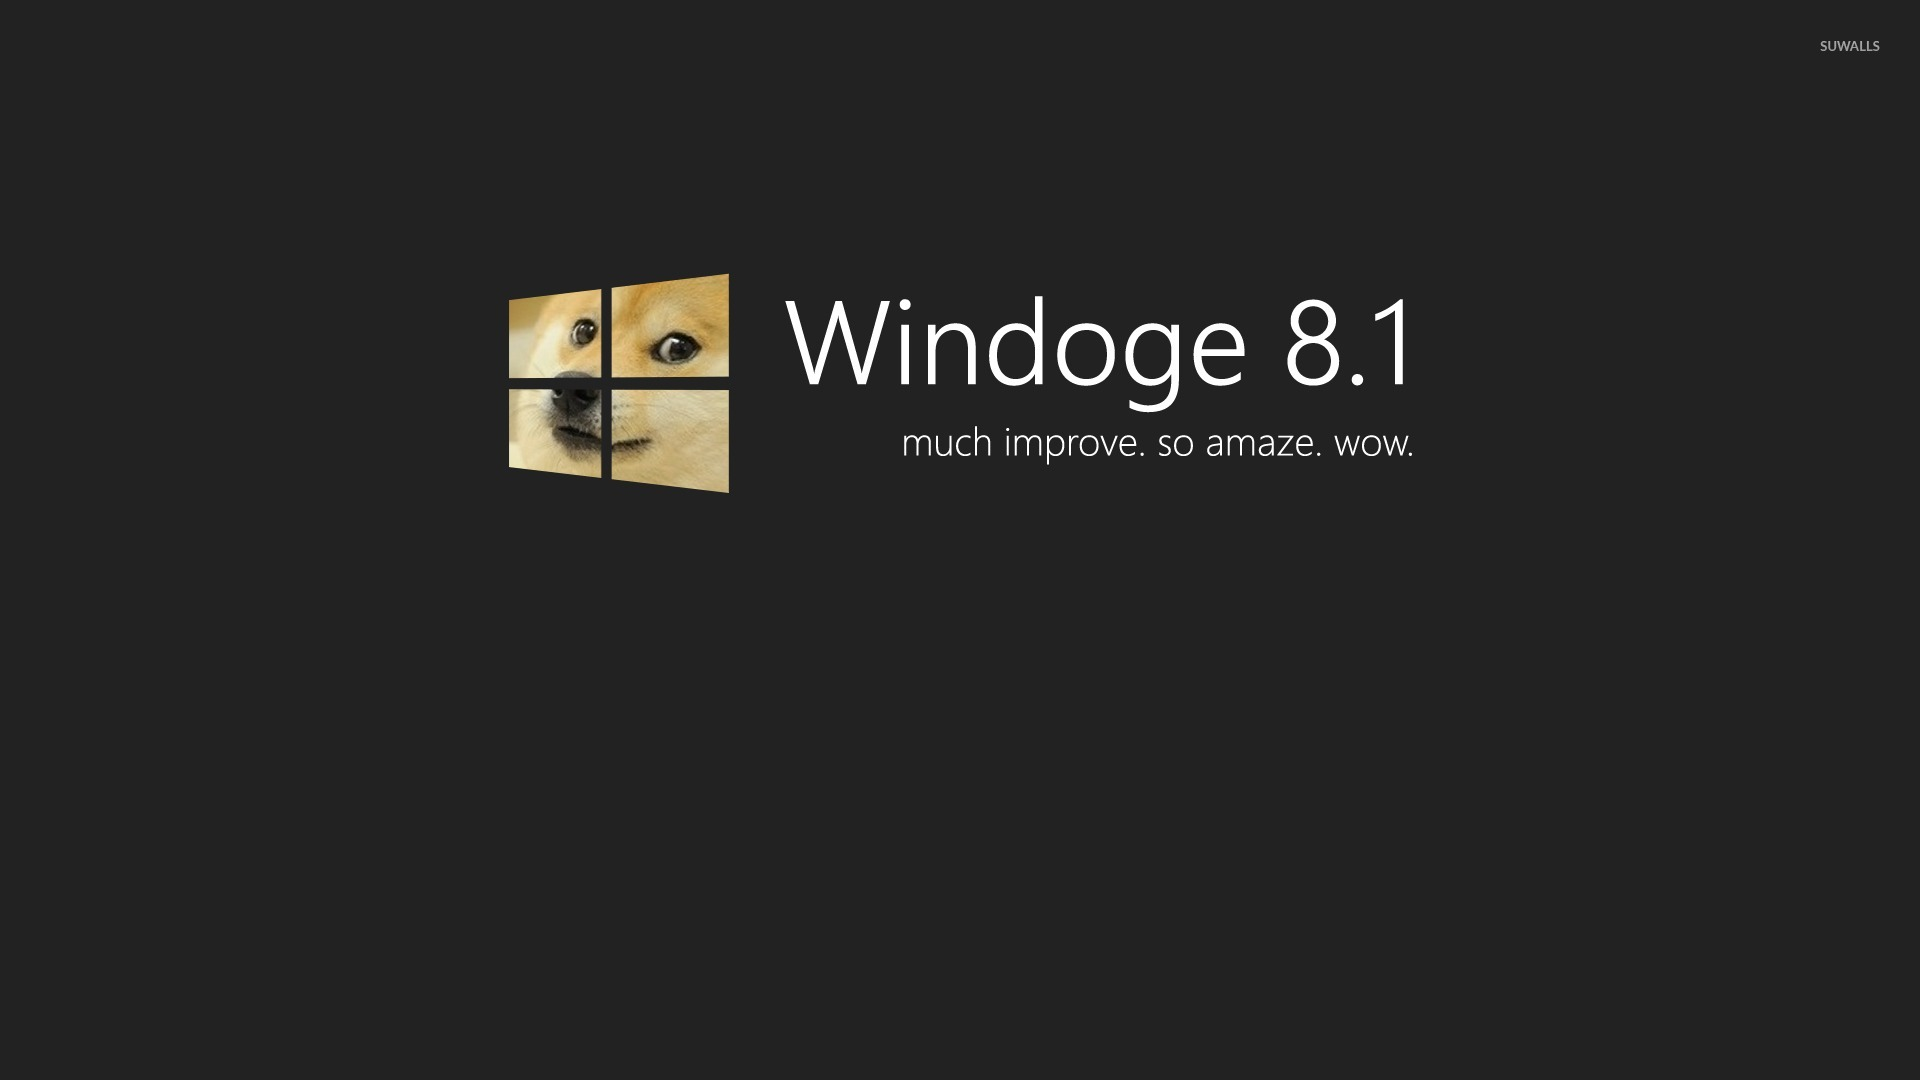 Doge Windows 81 Wallpaper Computer Wallpapers 27993